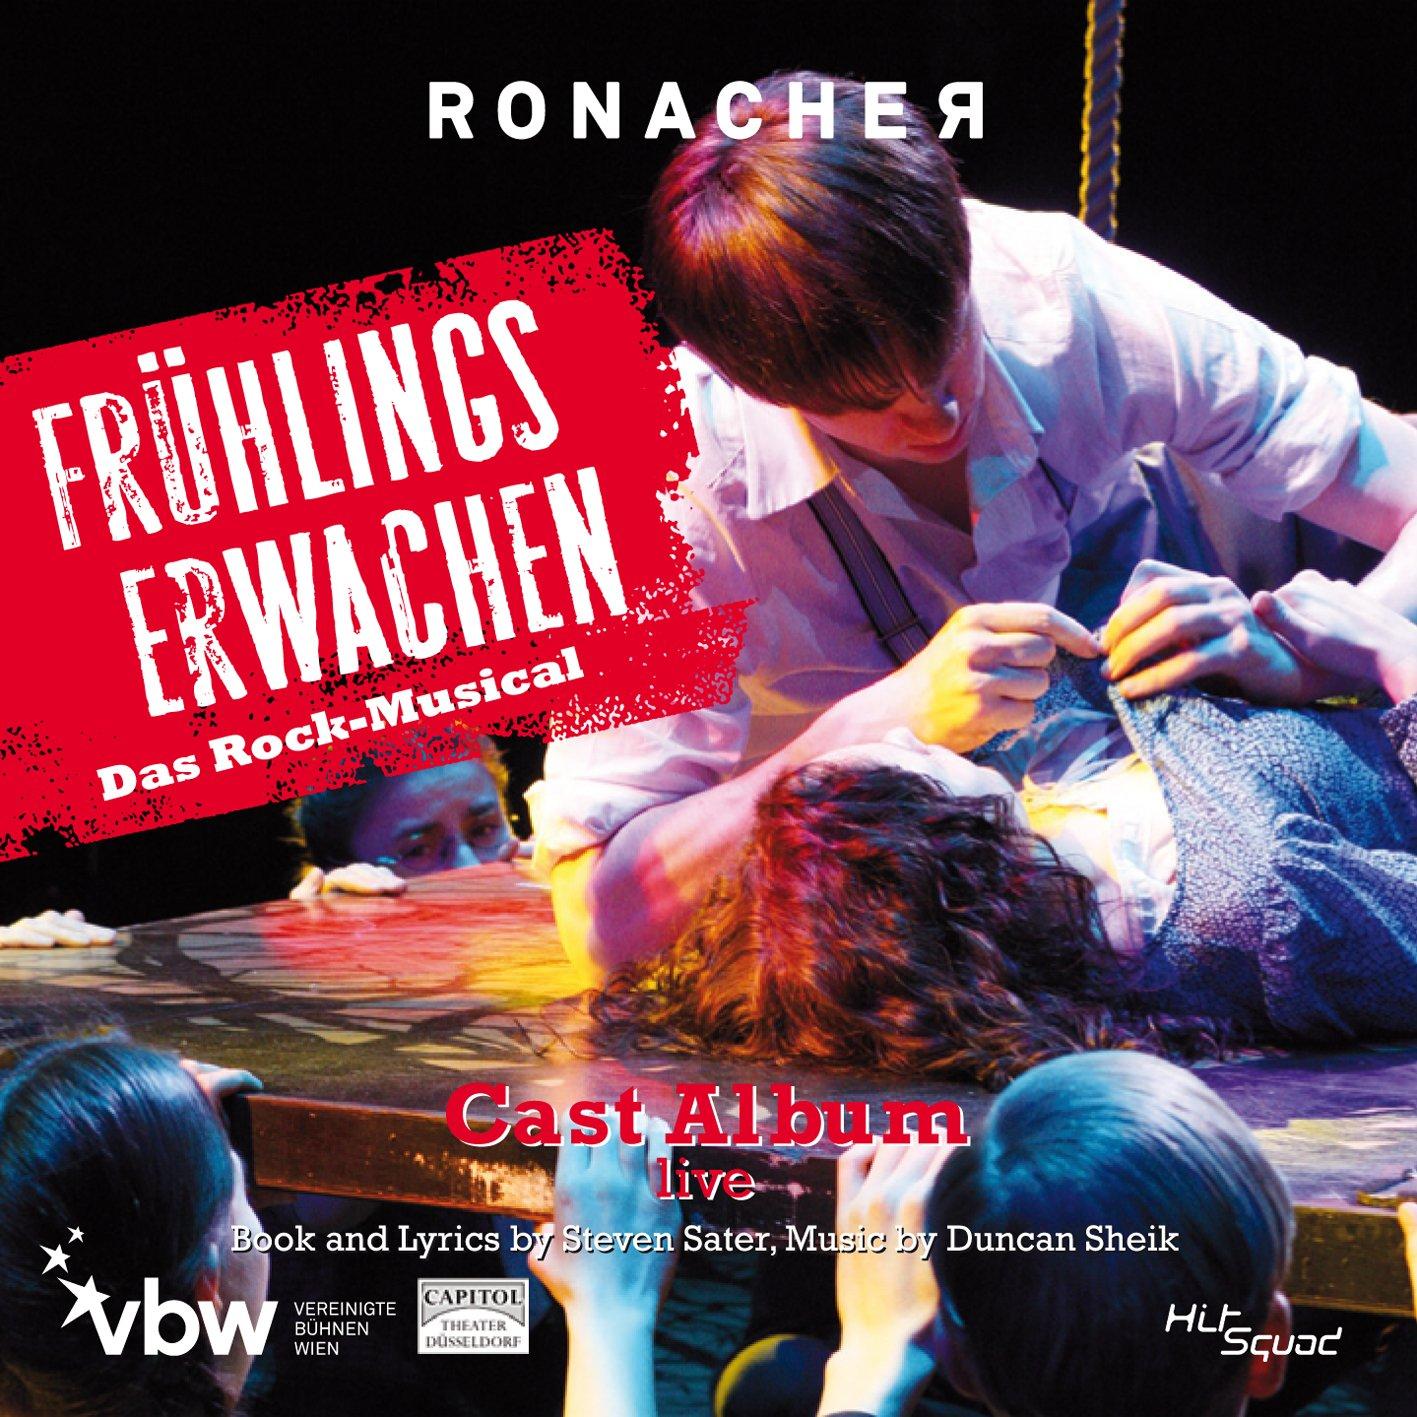 Frühlingserwachen Spring Awakening Das Rock Musical: Cast Album Live